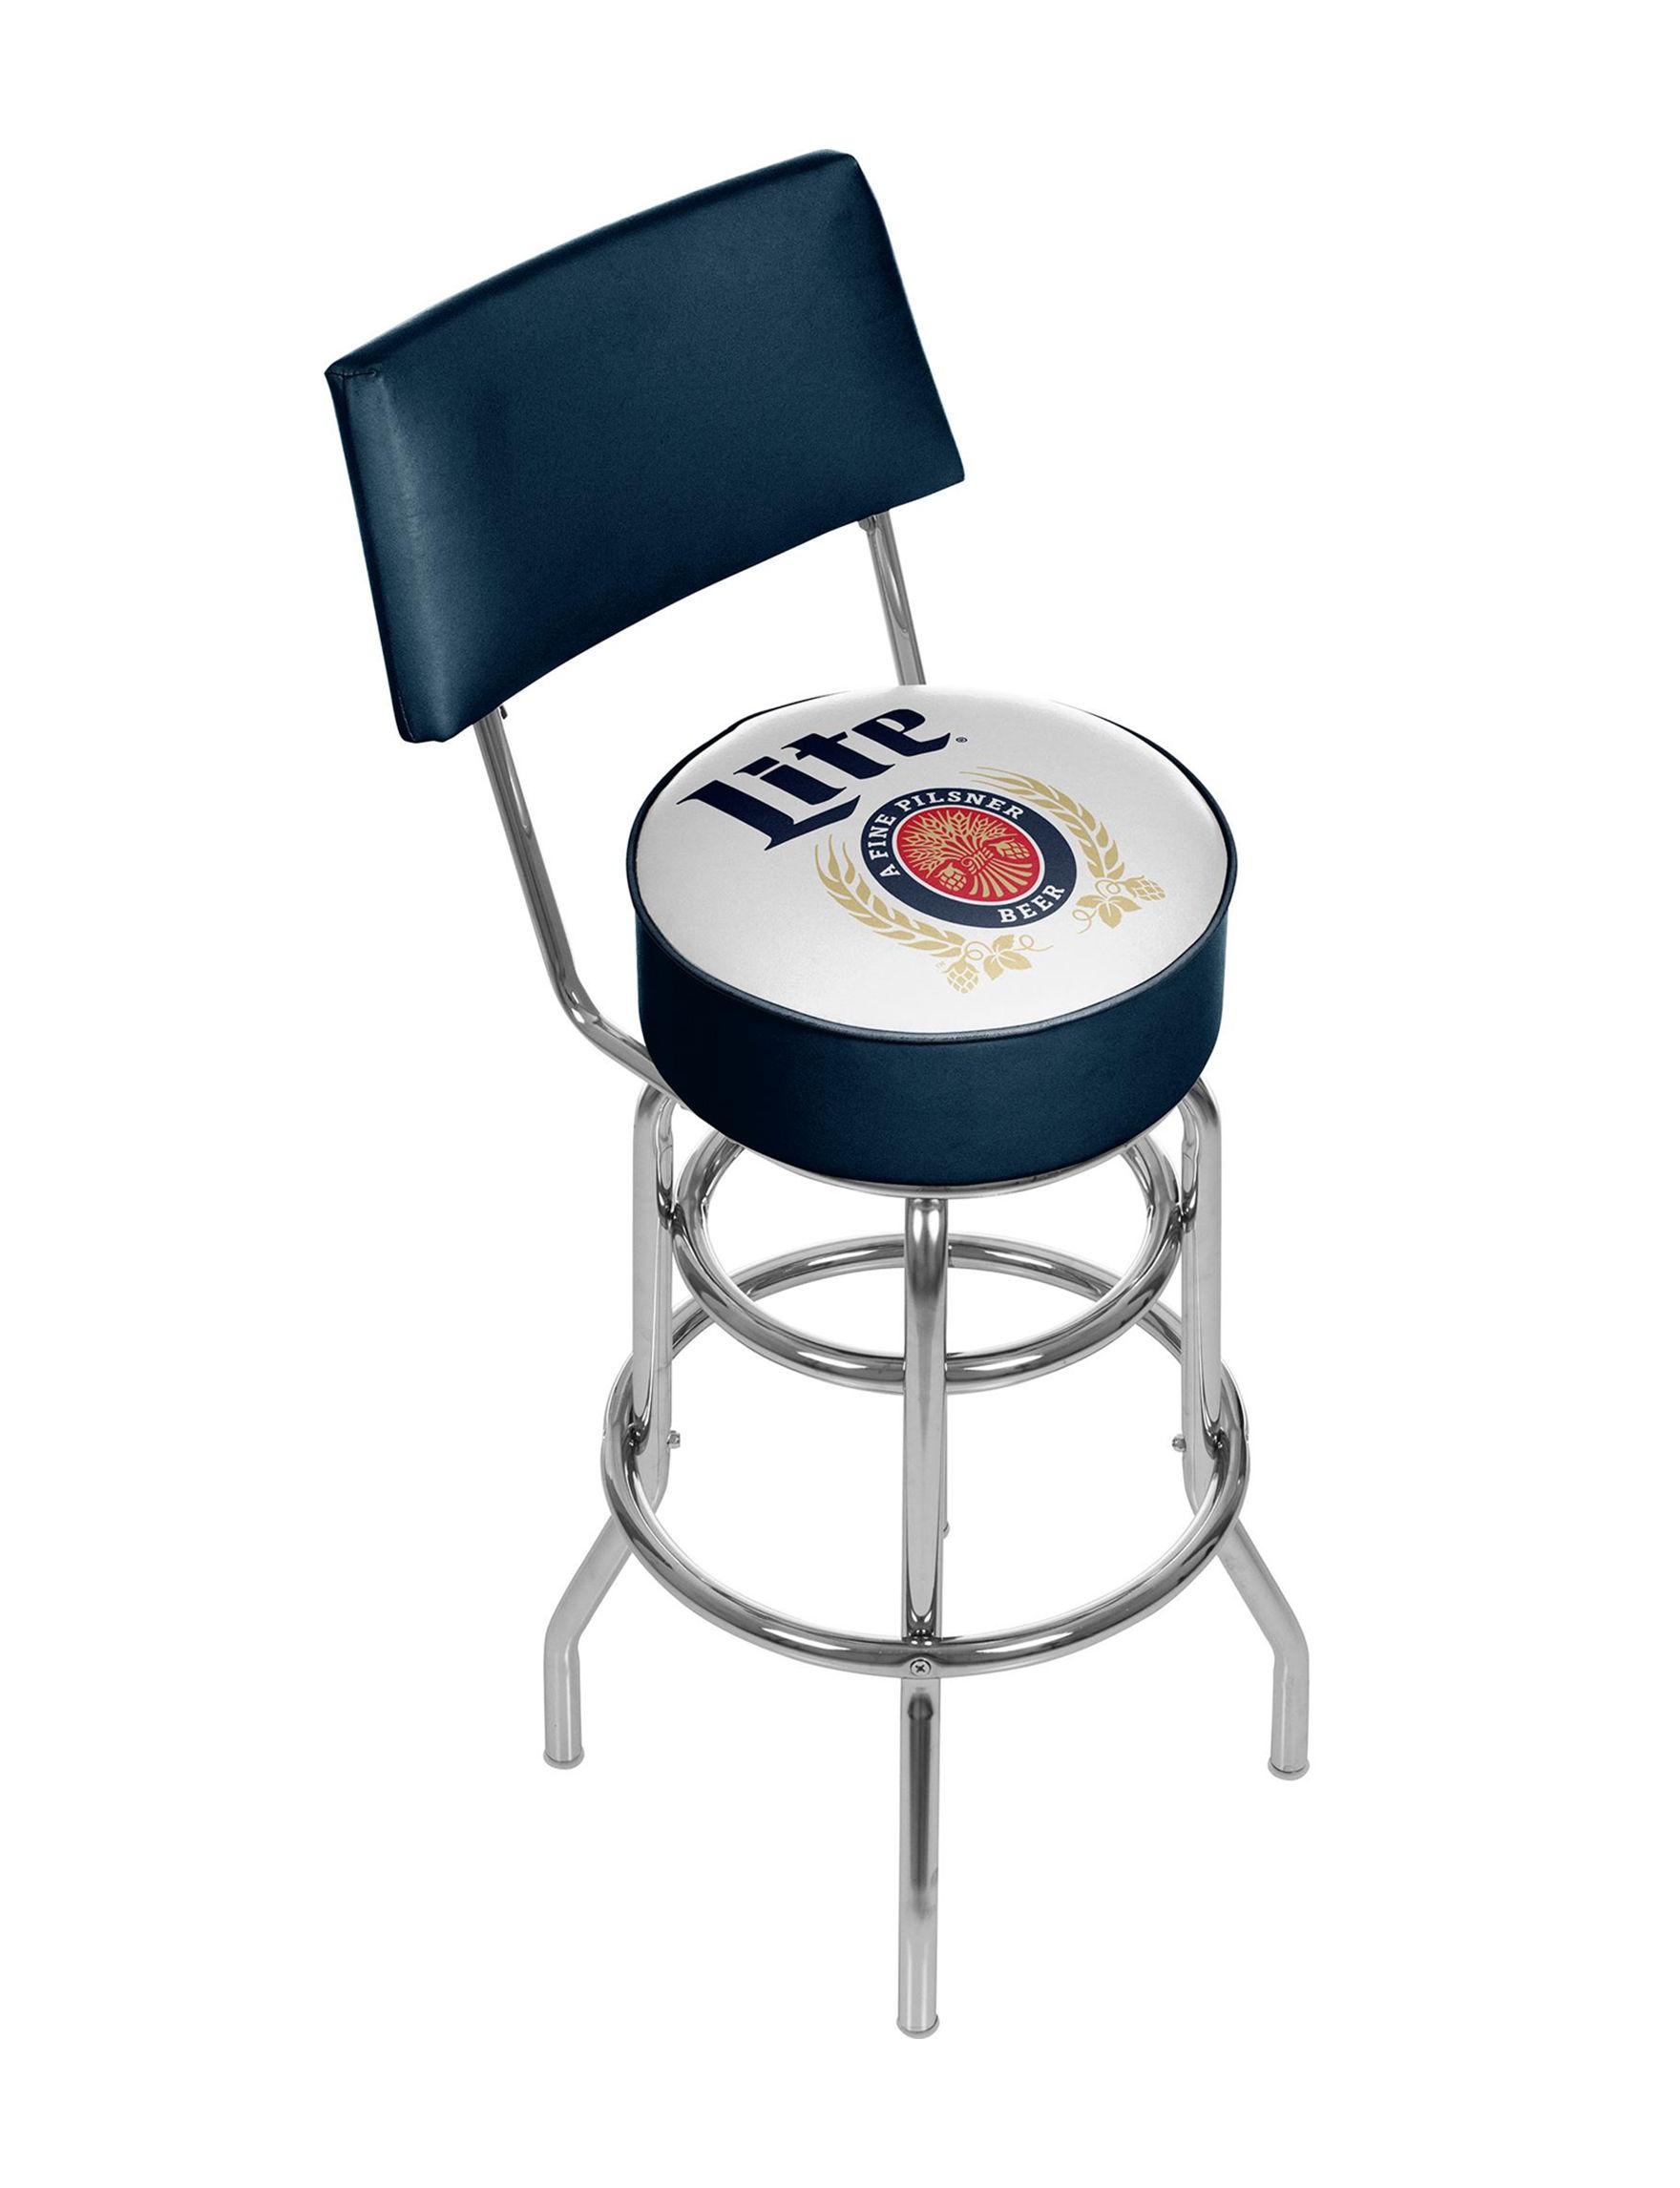 Trademark Global Red / White / Blue Bar & Kitchen Stools Kitchen & Dining Furniture